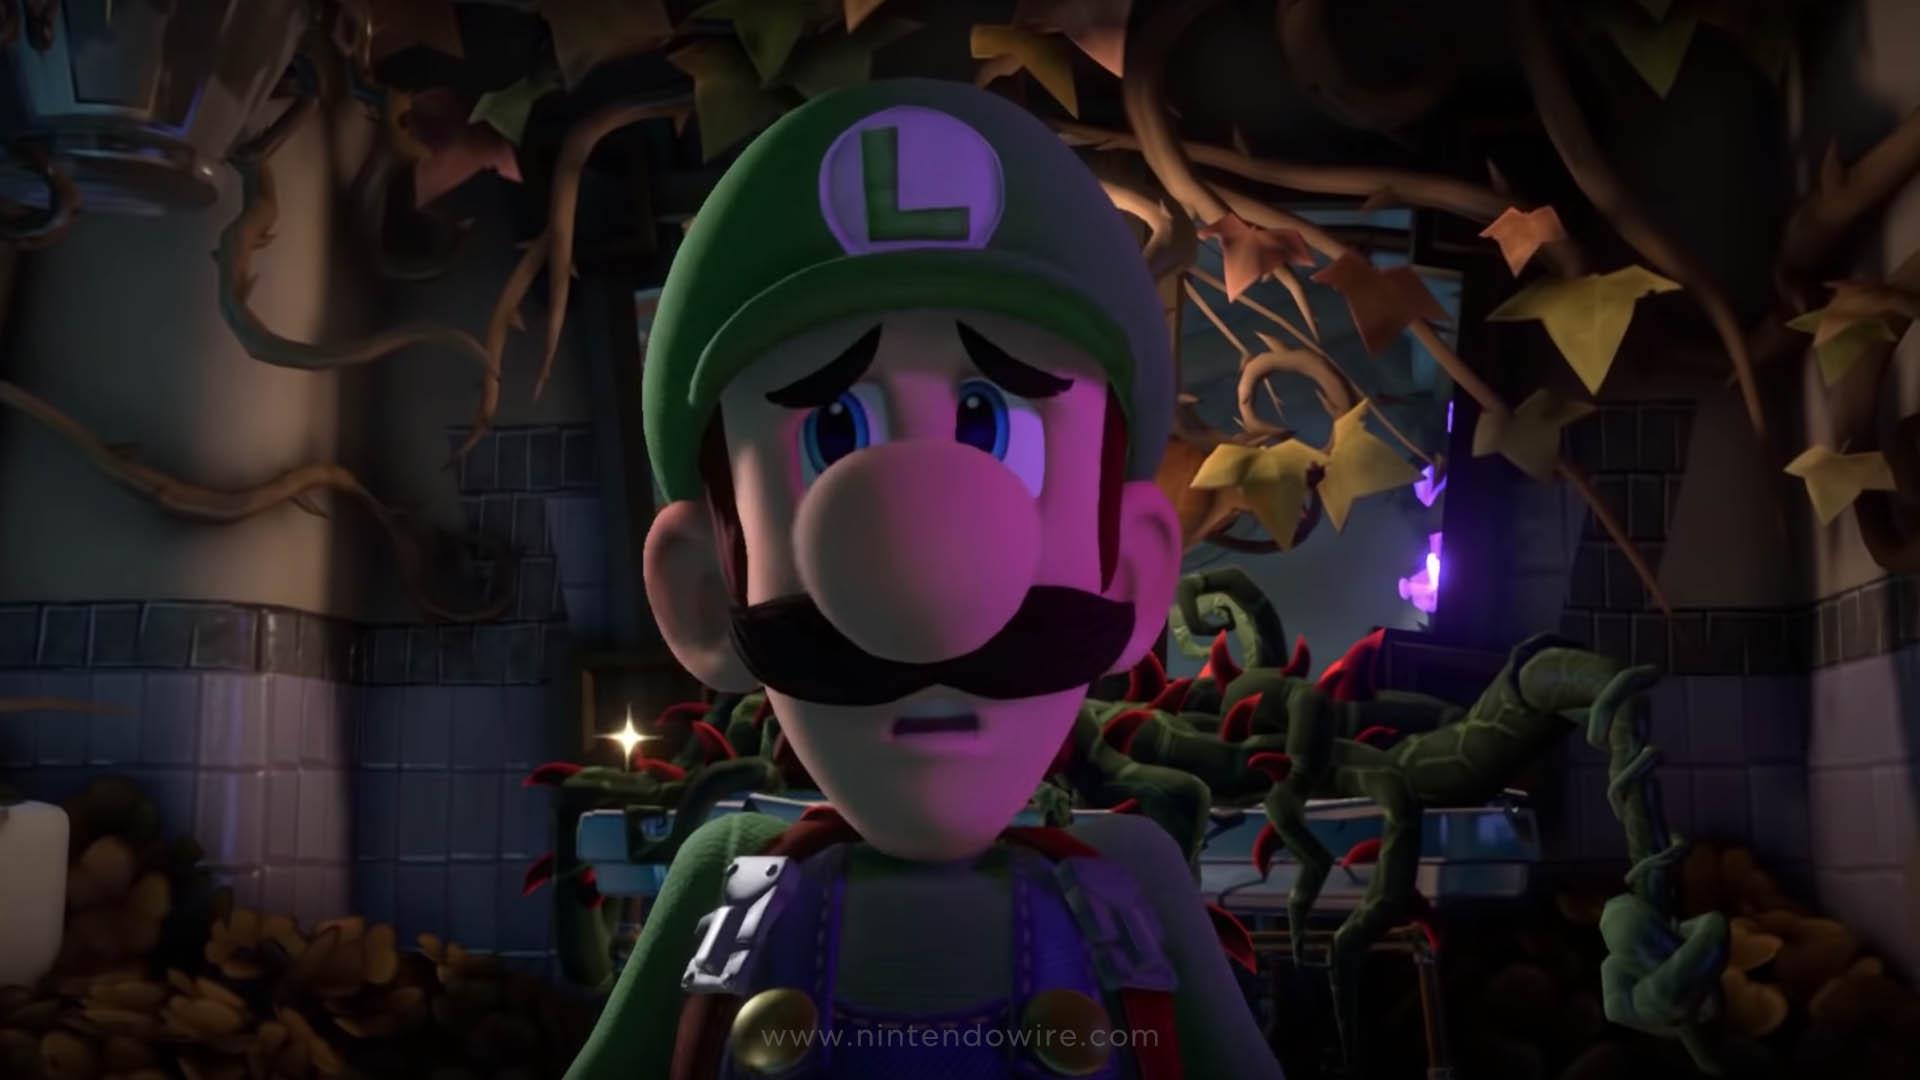 Gamescom Luigi S Mansion 3 Footage Shows A New Floor Of